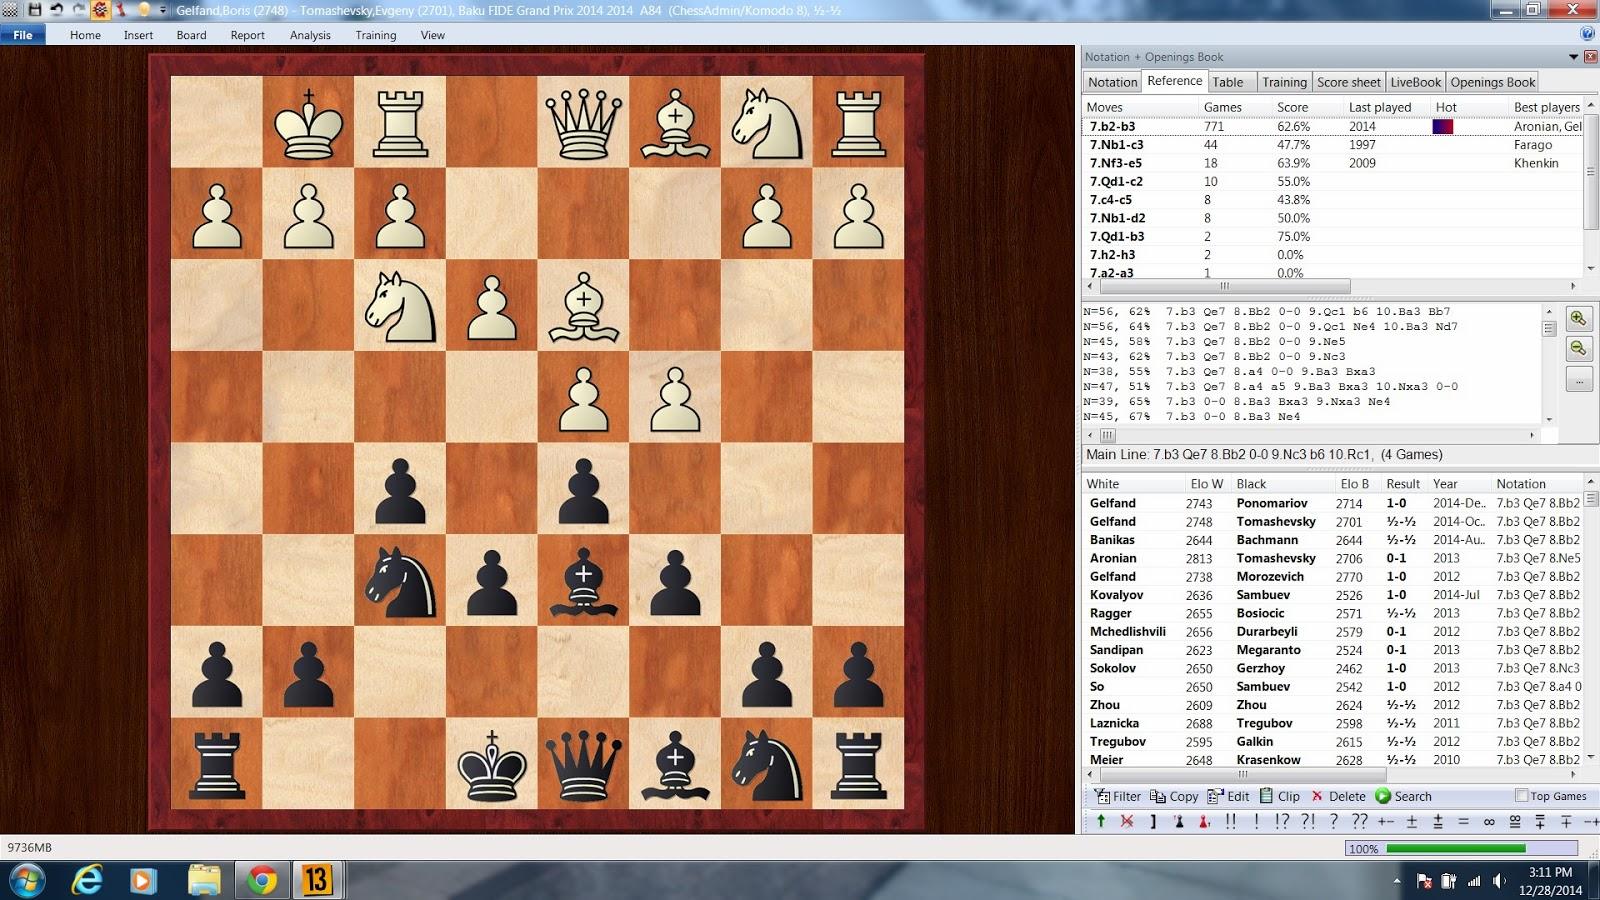 Chess Games Mega Database 2016 Full Version PC Game Download Free -Free Download PC Games Repack ...